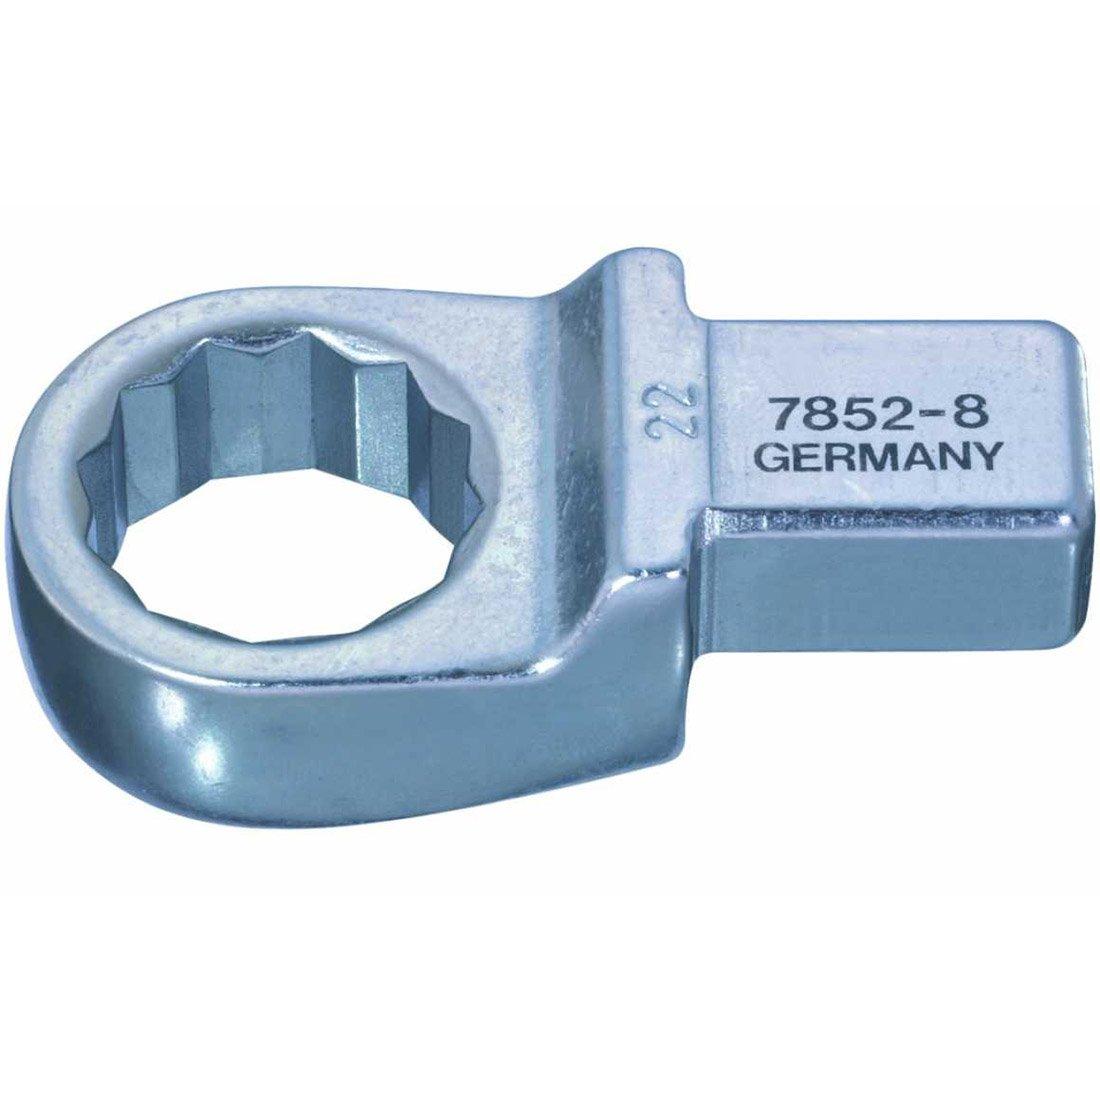 Insert Ring 14 X 18 Bahco 7852-8-13